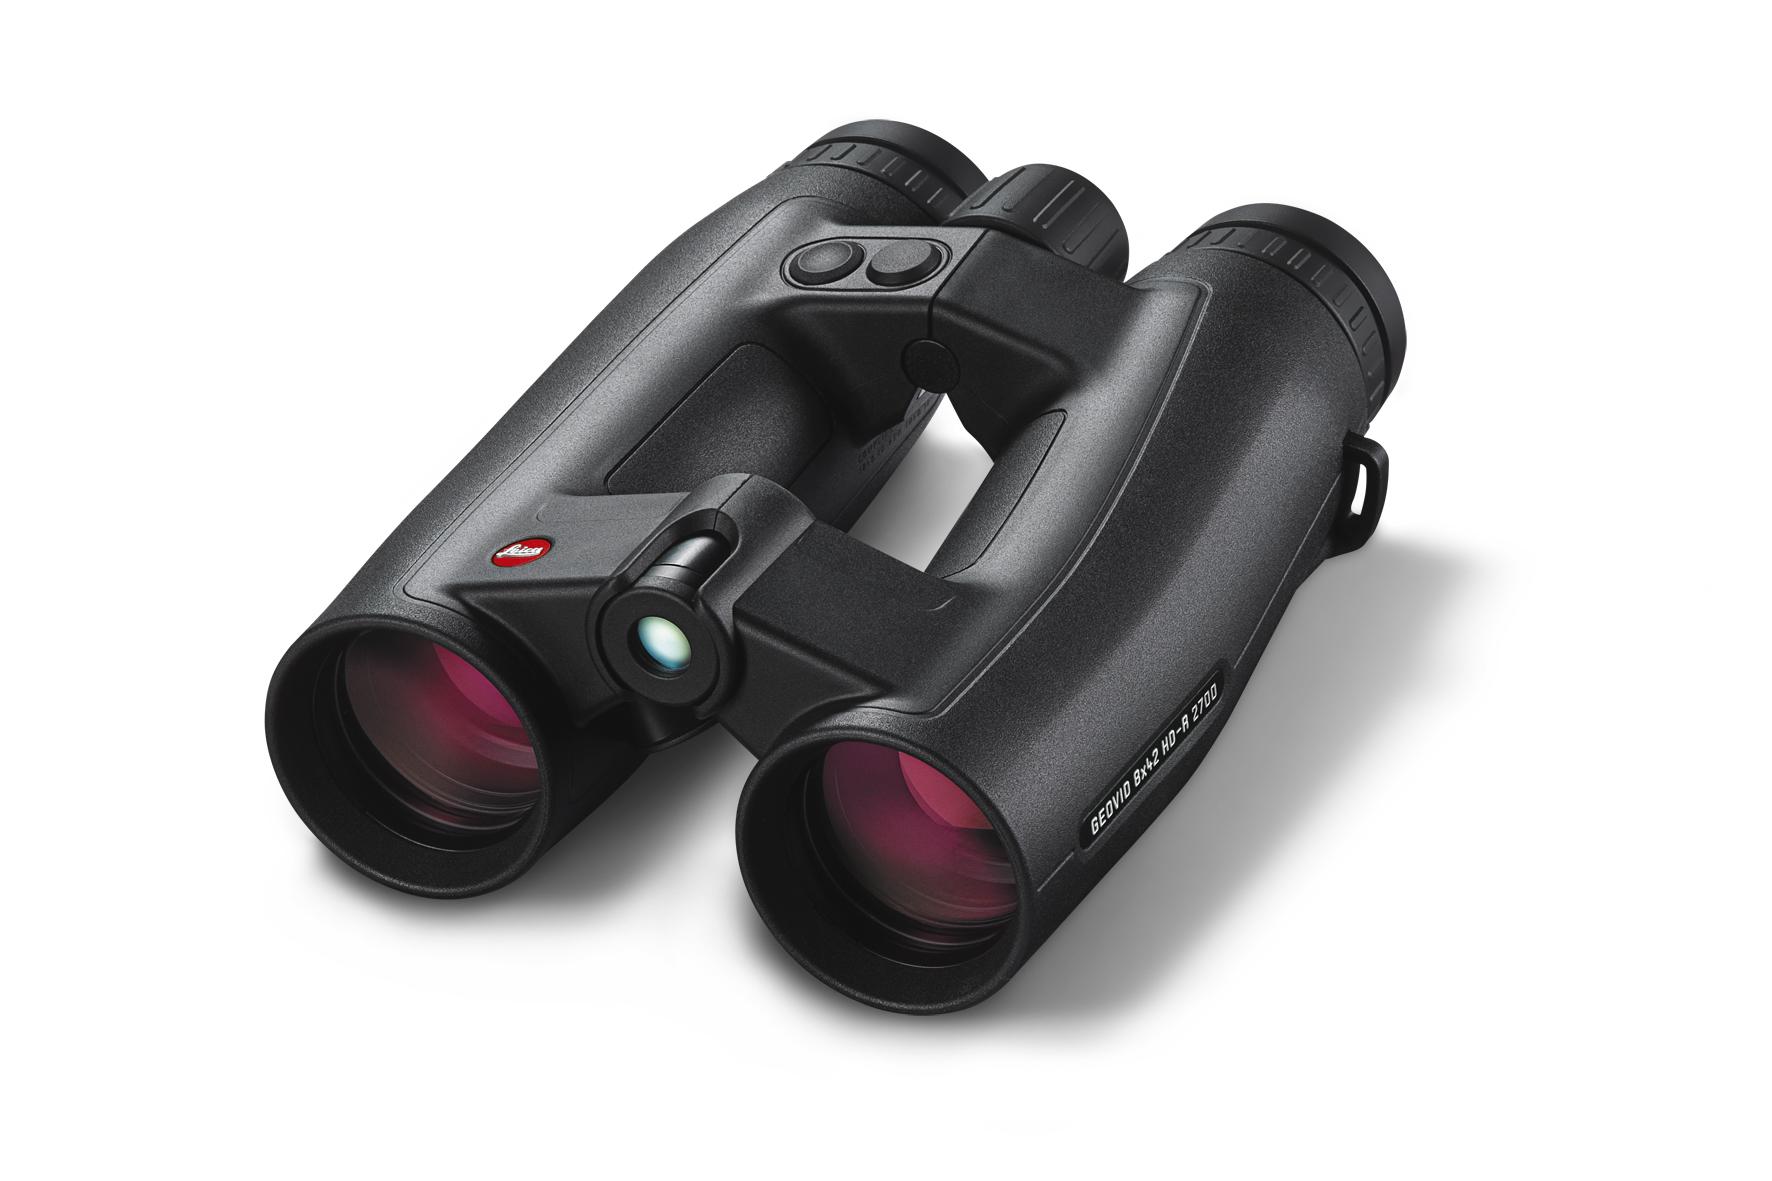 Sightmark Fernglas Mit Entfernungsmesser Solitude 10x42 : Entfernungsmesser mit ballistikrechner superjagd jagd shop